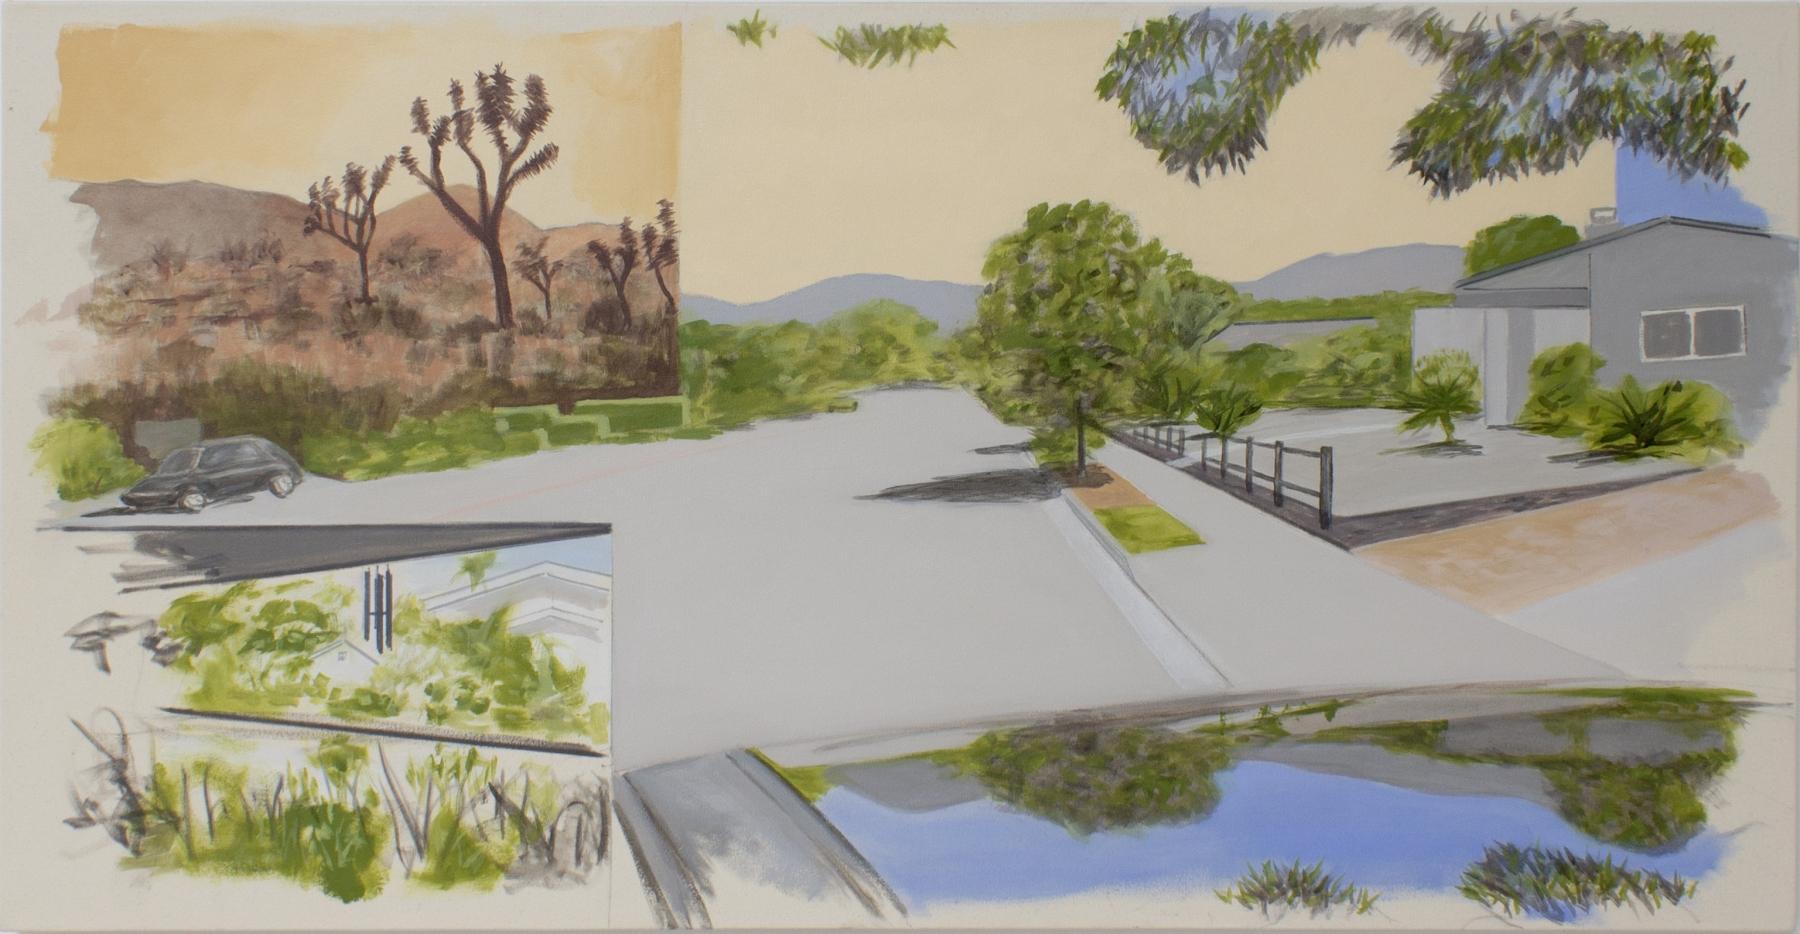 William Leavitt, Garden, Joshua Trees, Street, Reflection, 2020